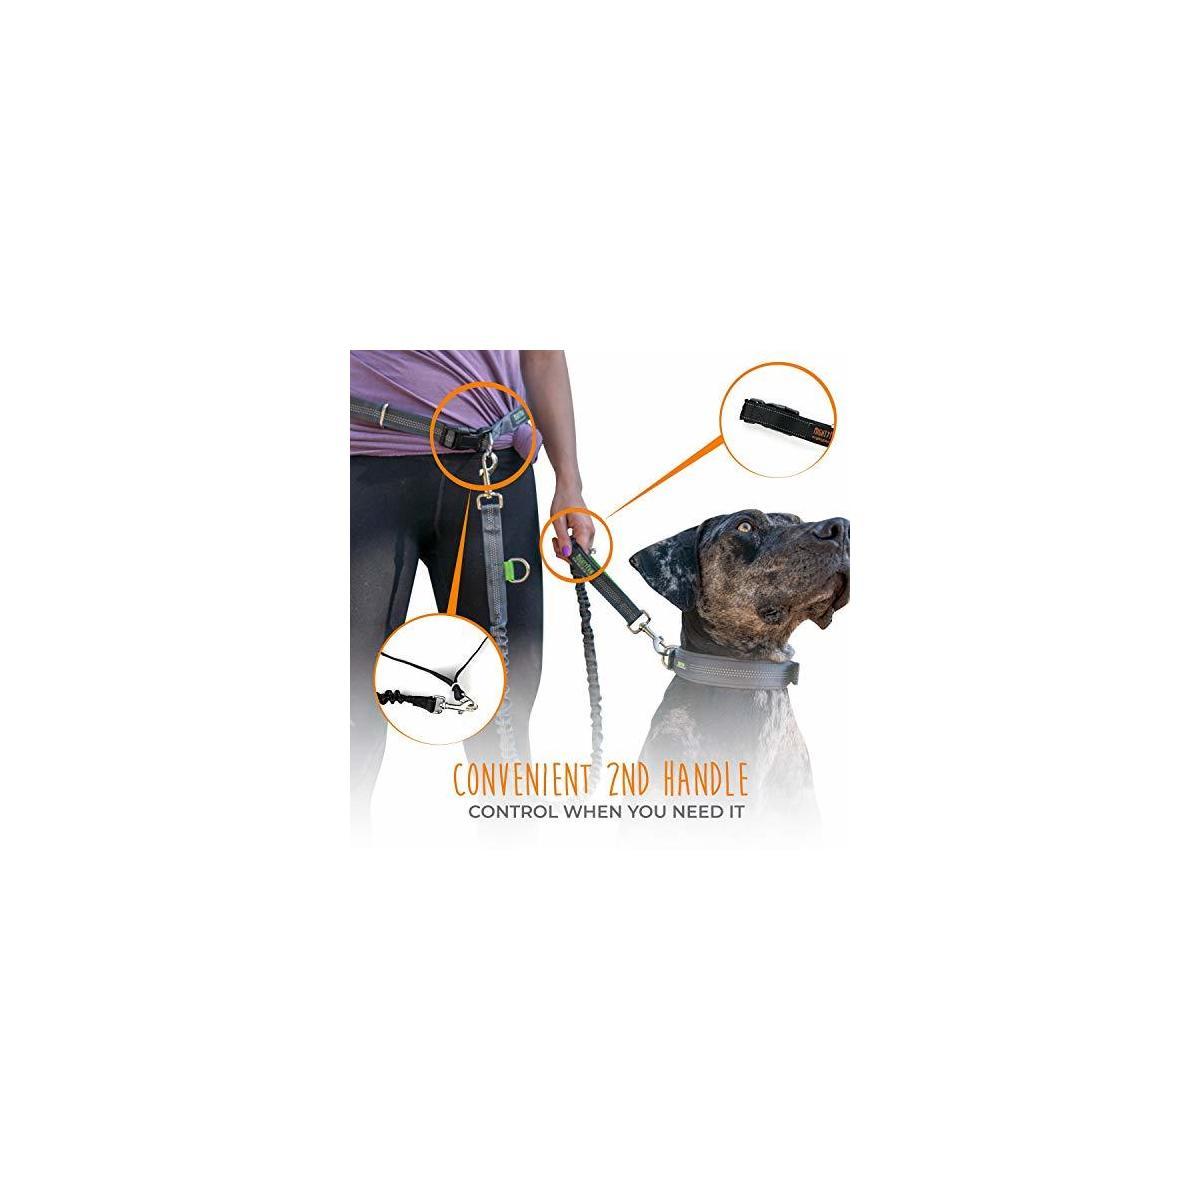 Mighty Paw Hands Free Dog Leash, Premium Running Dog Leash, Lightweight Reflective Bungee Dog Leash